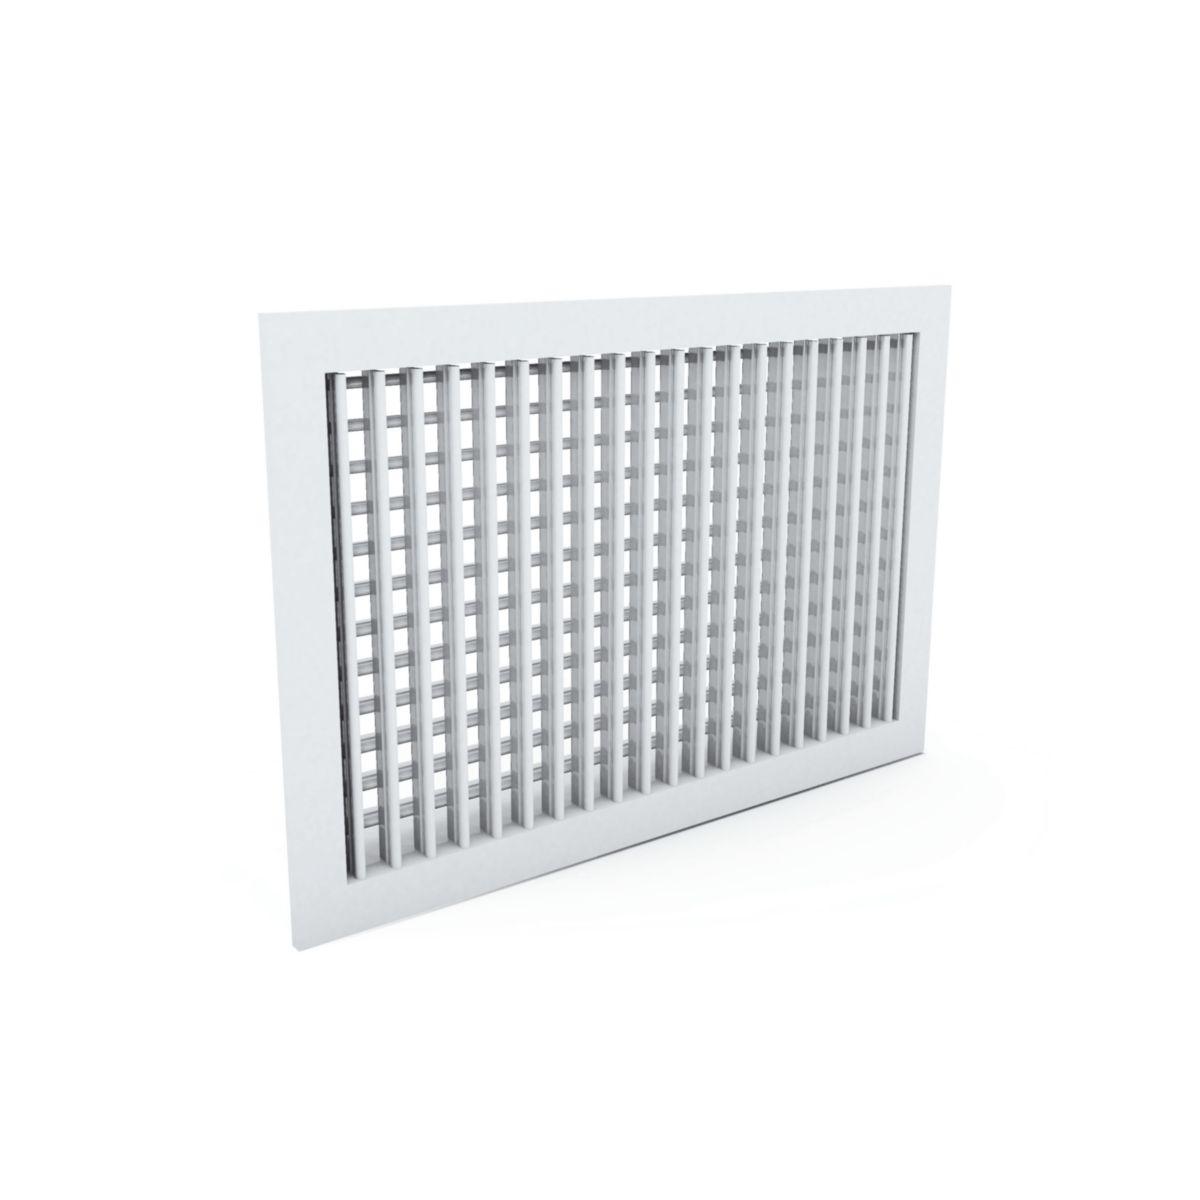 Grille aluminium 300X150 double deflex, réf AD130 300X150